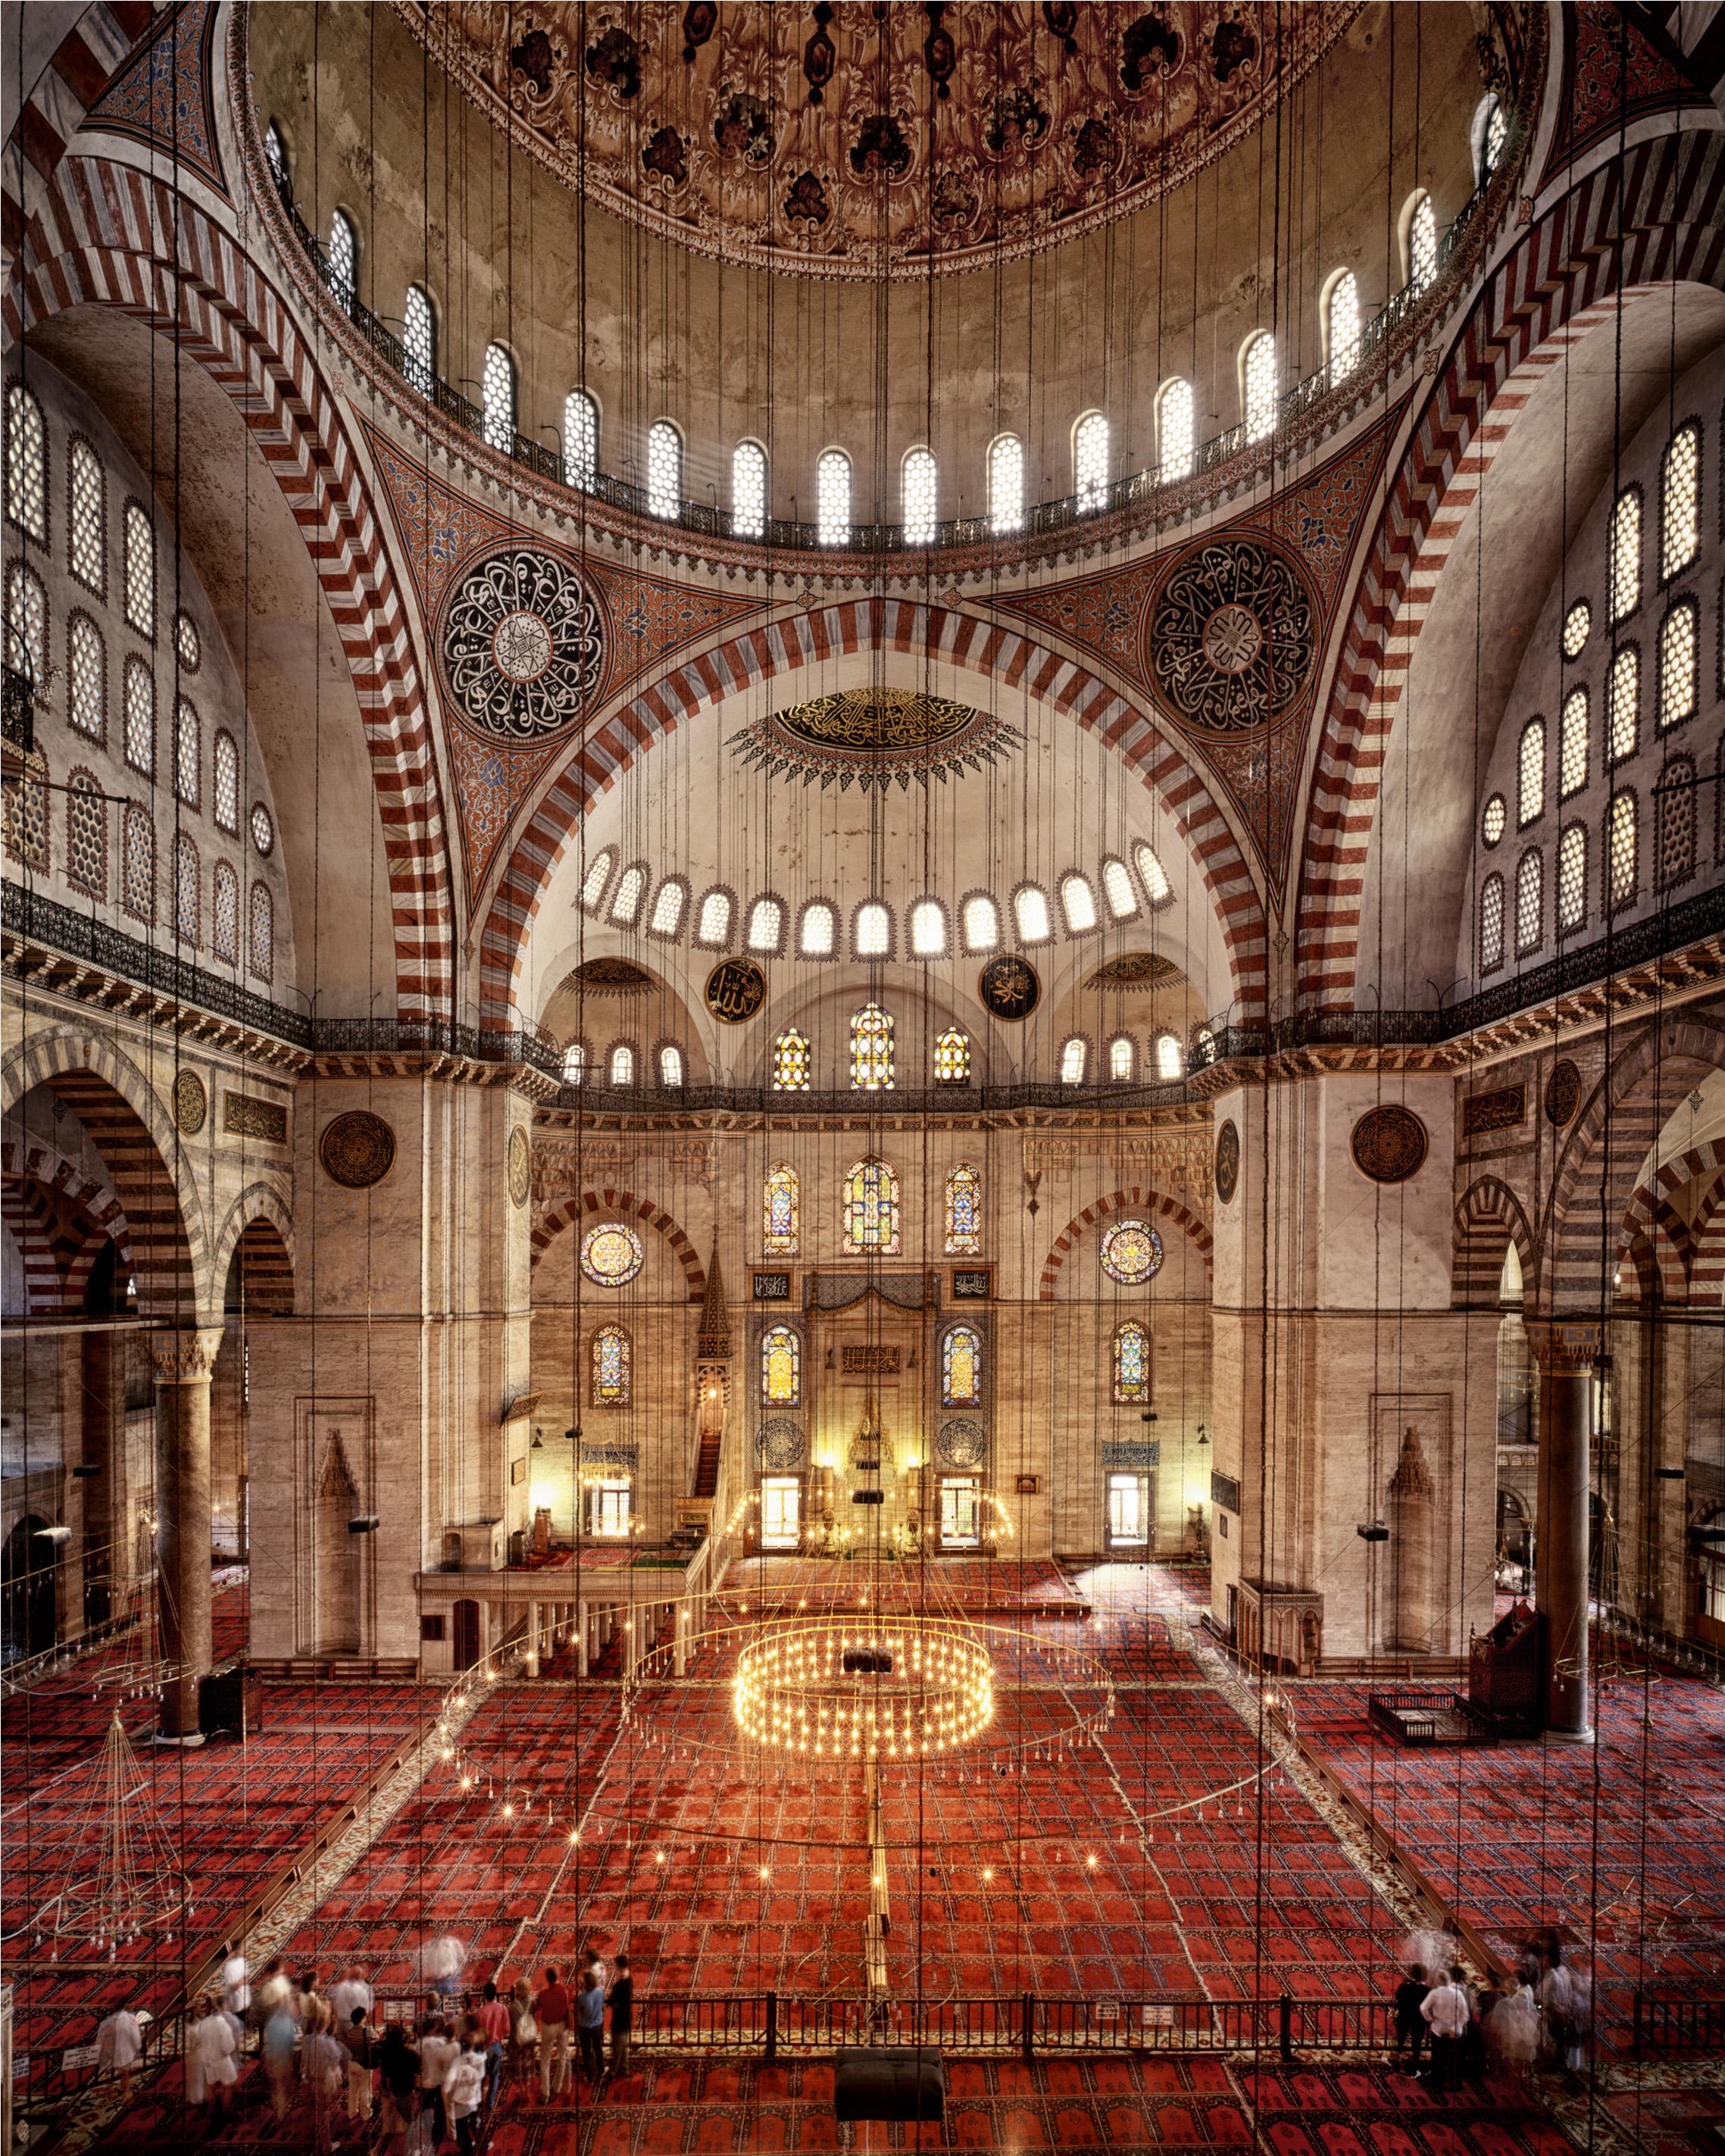 Mosque - Instanbul, Turkey 1999